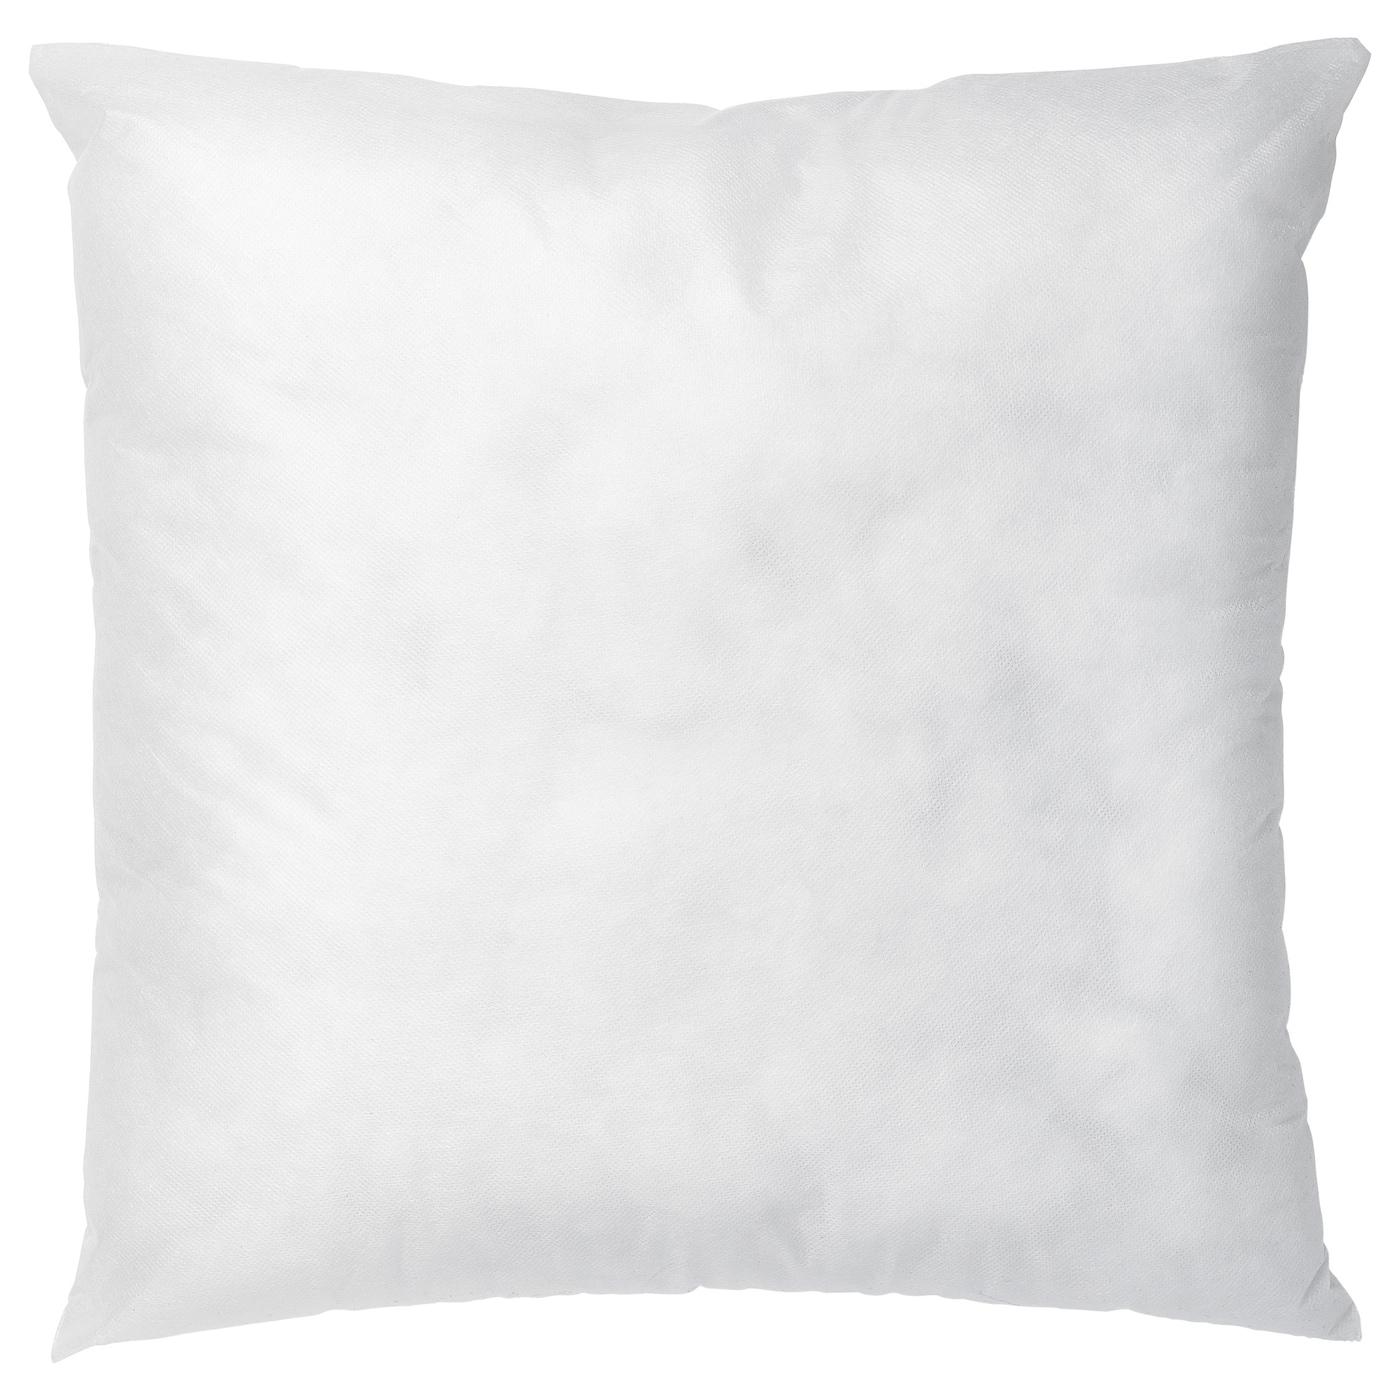 Imbottitura Cuscini Divano Ikea.Inner Interno Per Cuscino Bianco 50x50 Cm Ikea